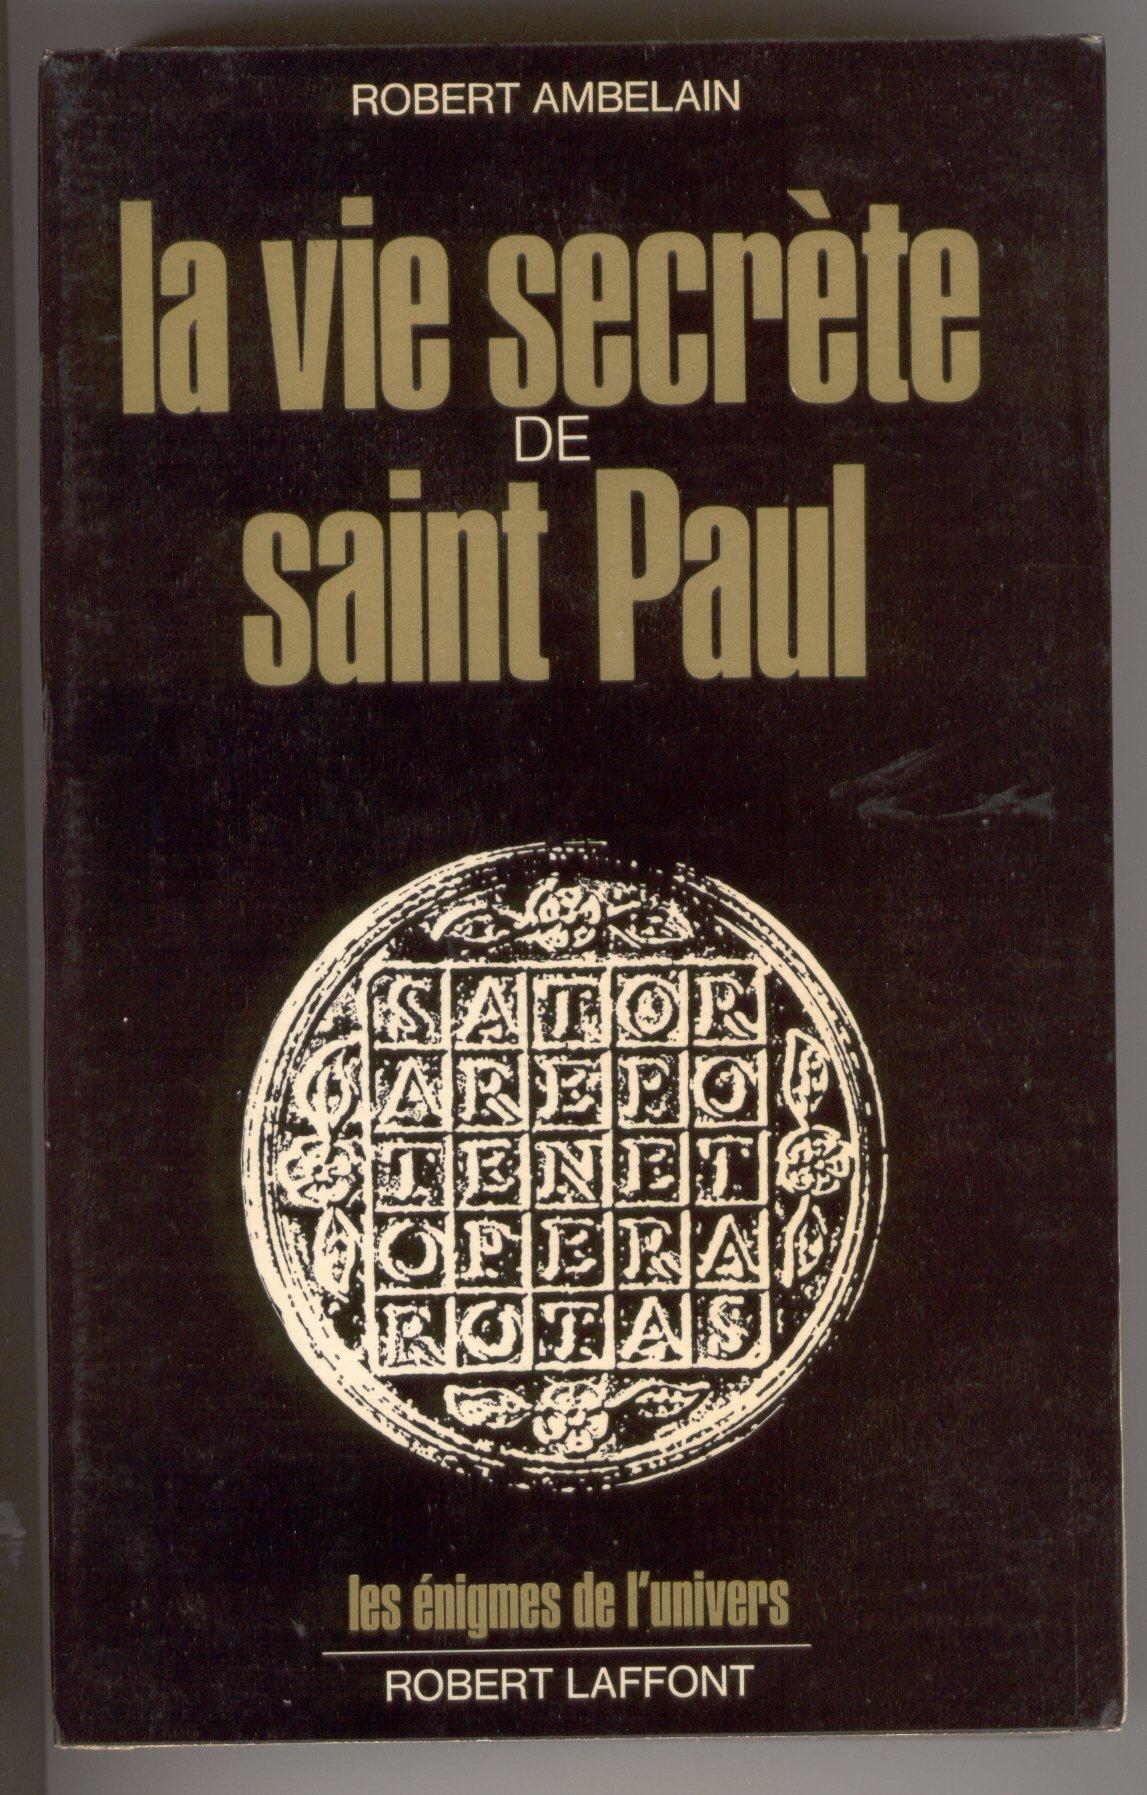 La vie secrète de Saint Paul Broché – 1 janvier 1971 Robert Ambelain B004I345ZG 201207991